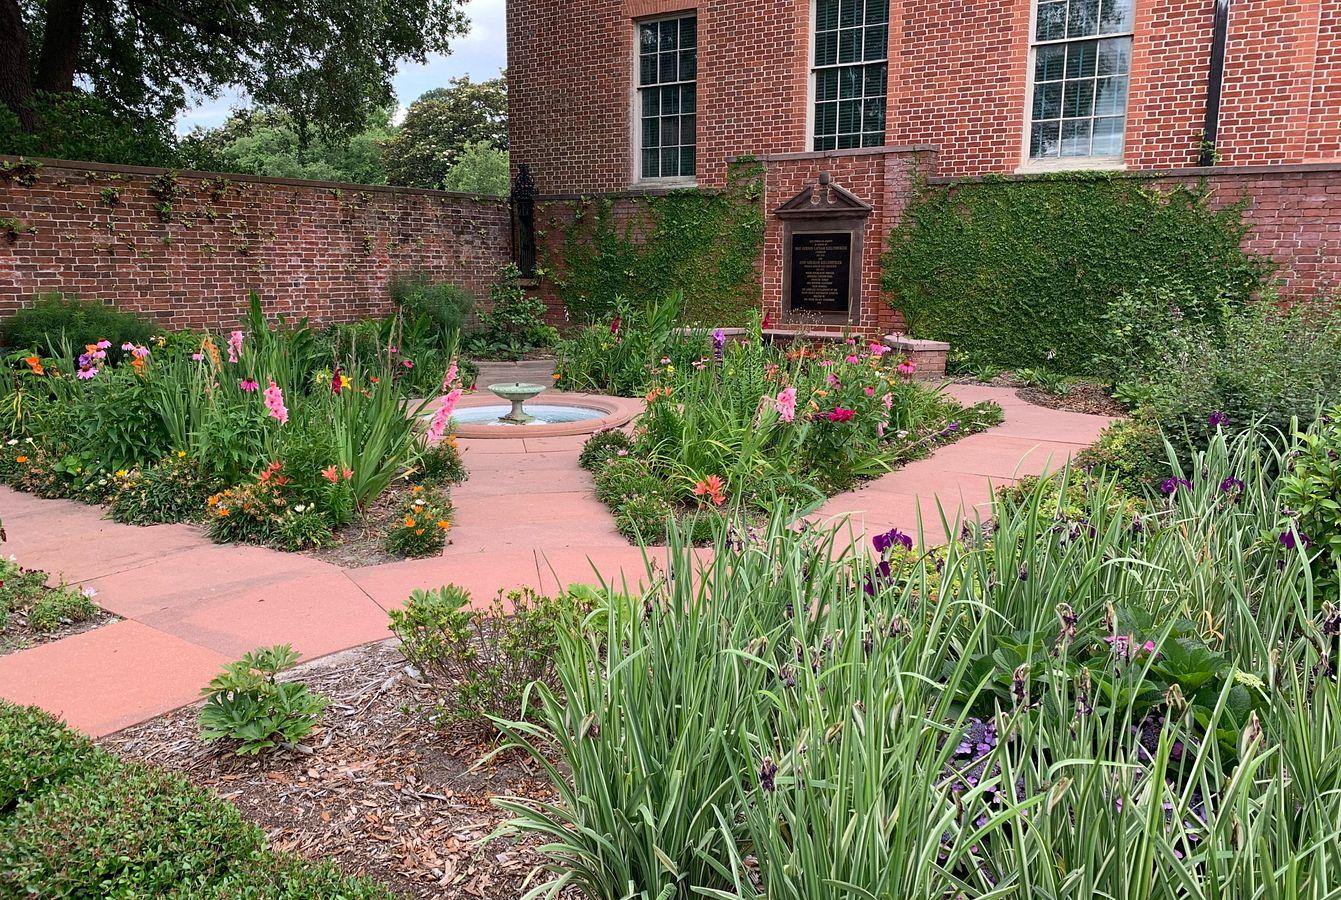 Kellenberger Garden in Summer